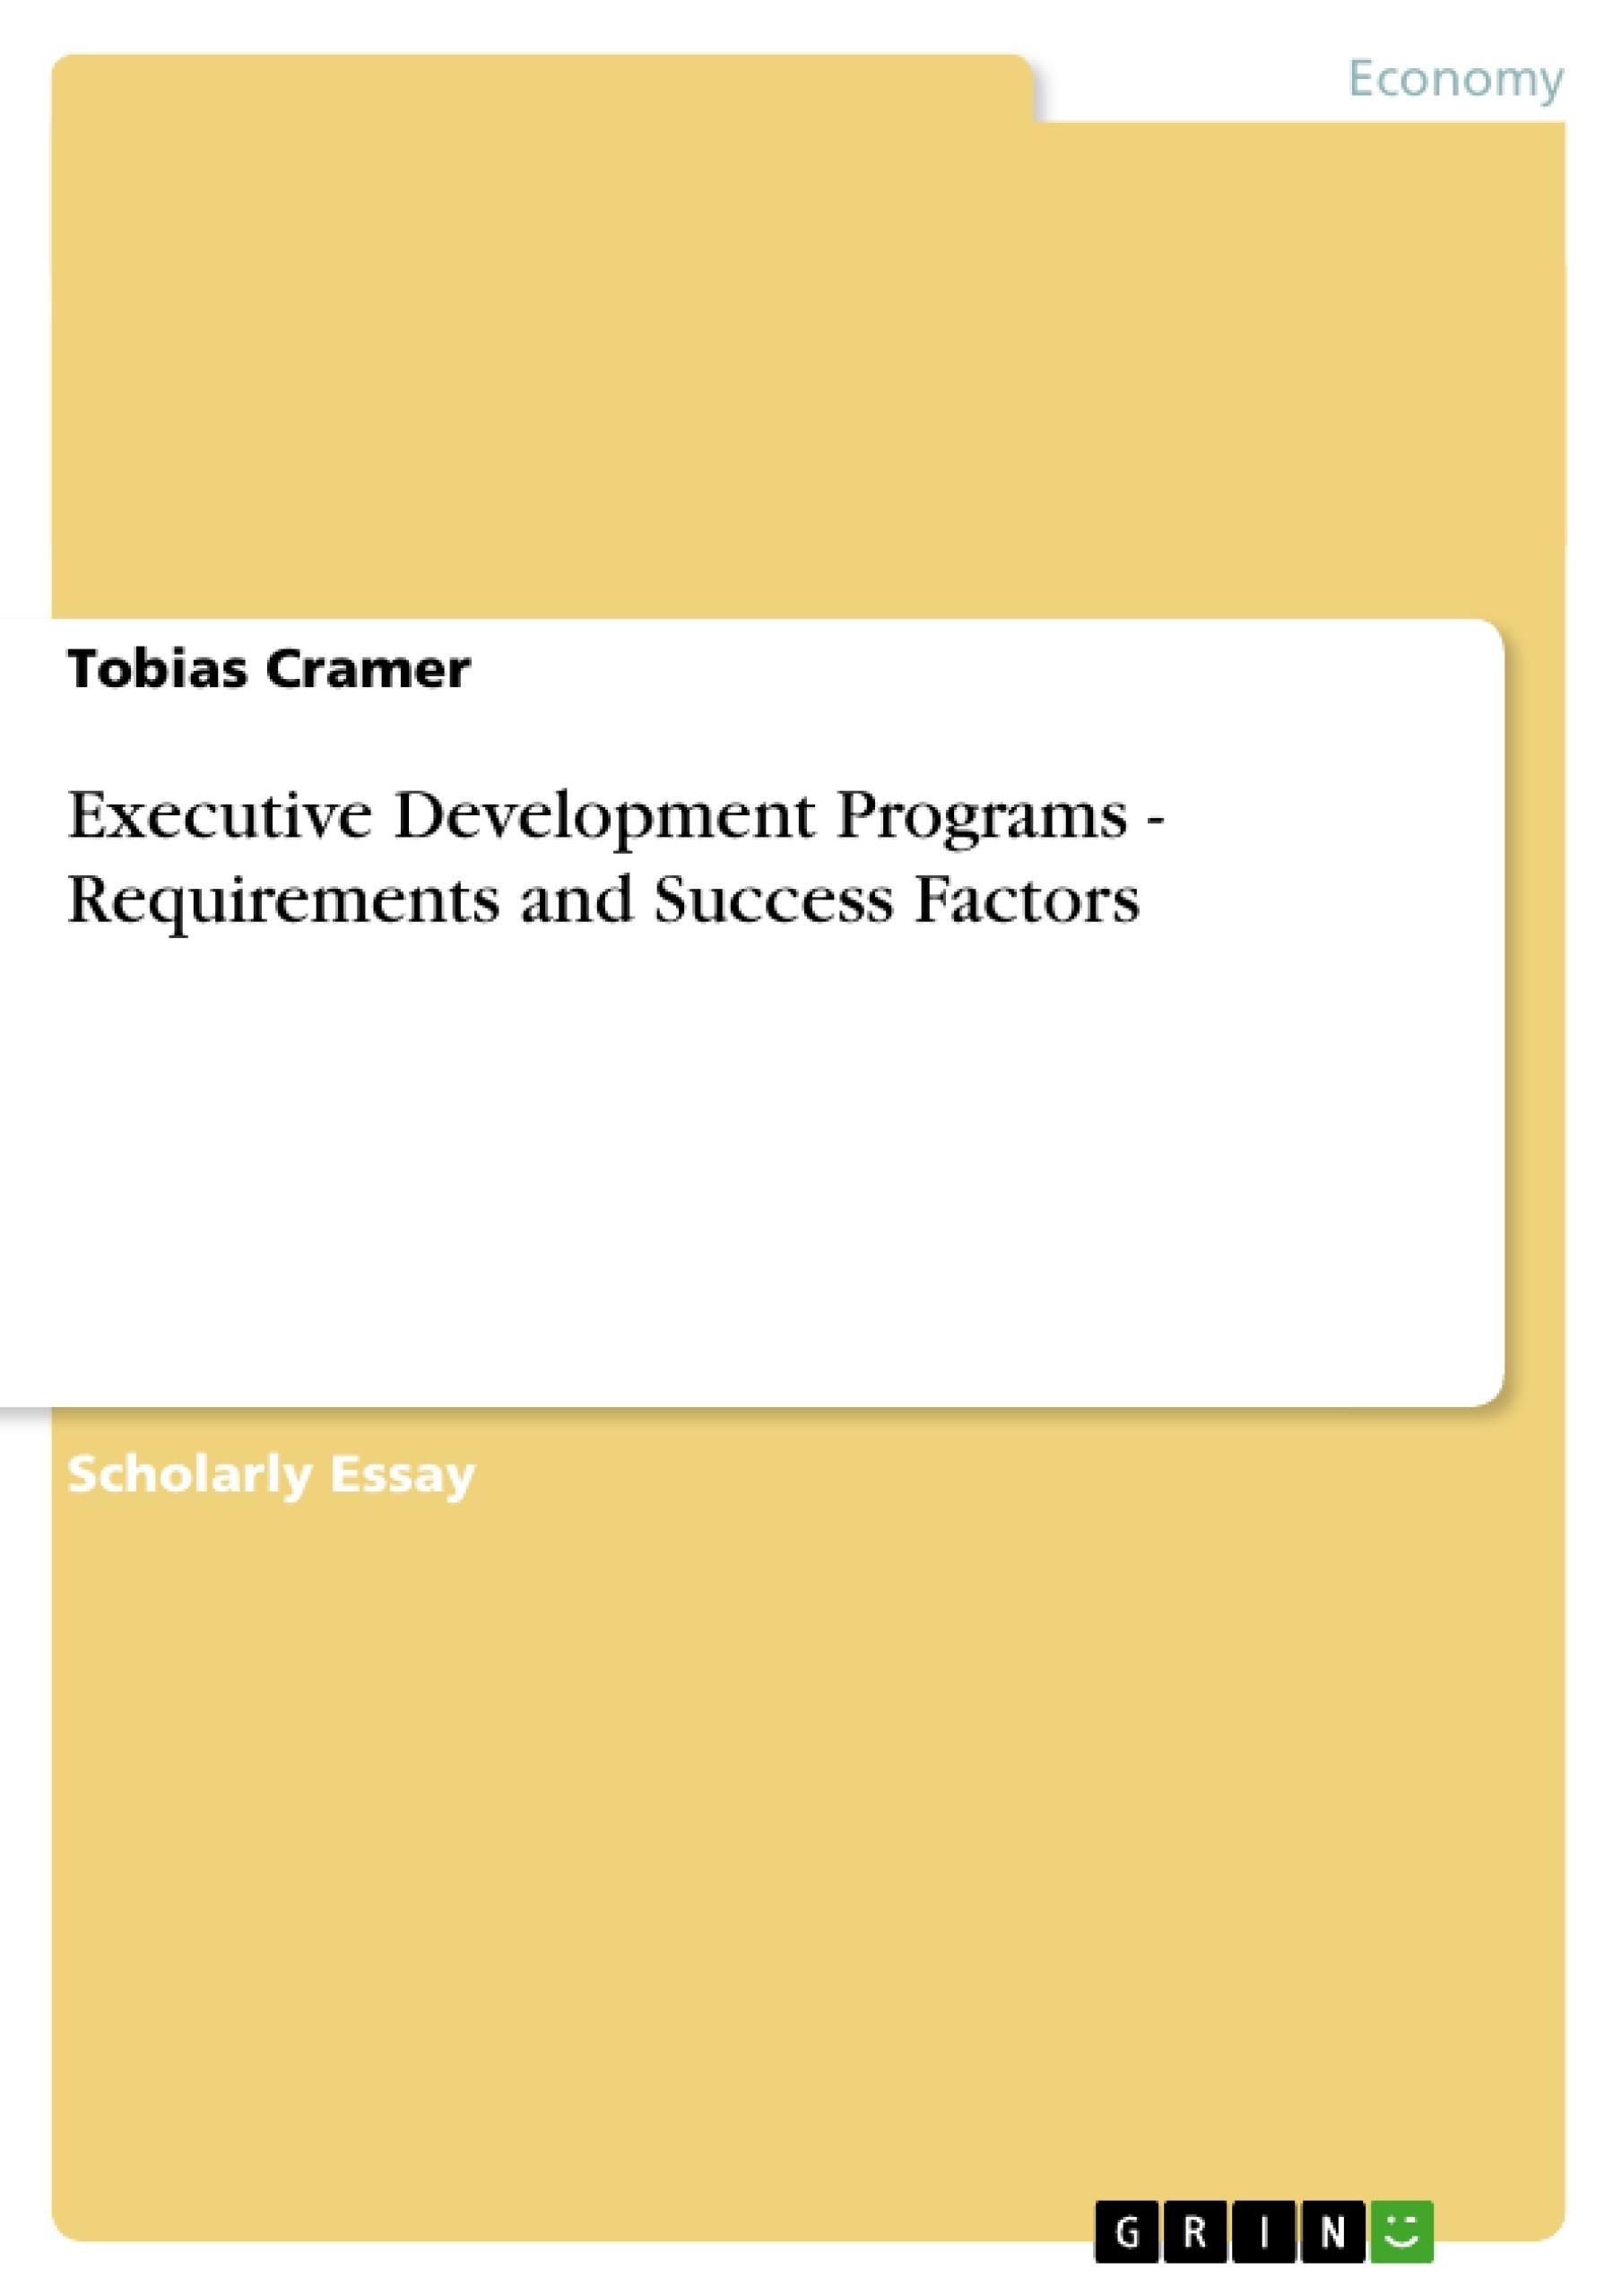 Title: Executive Development Programs - Requirements and Success Factors